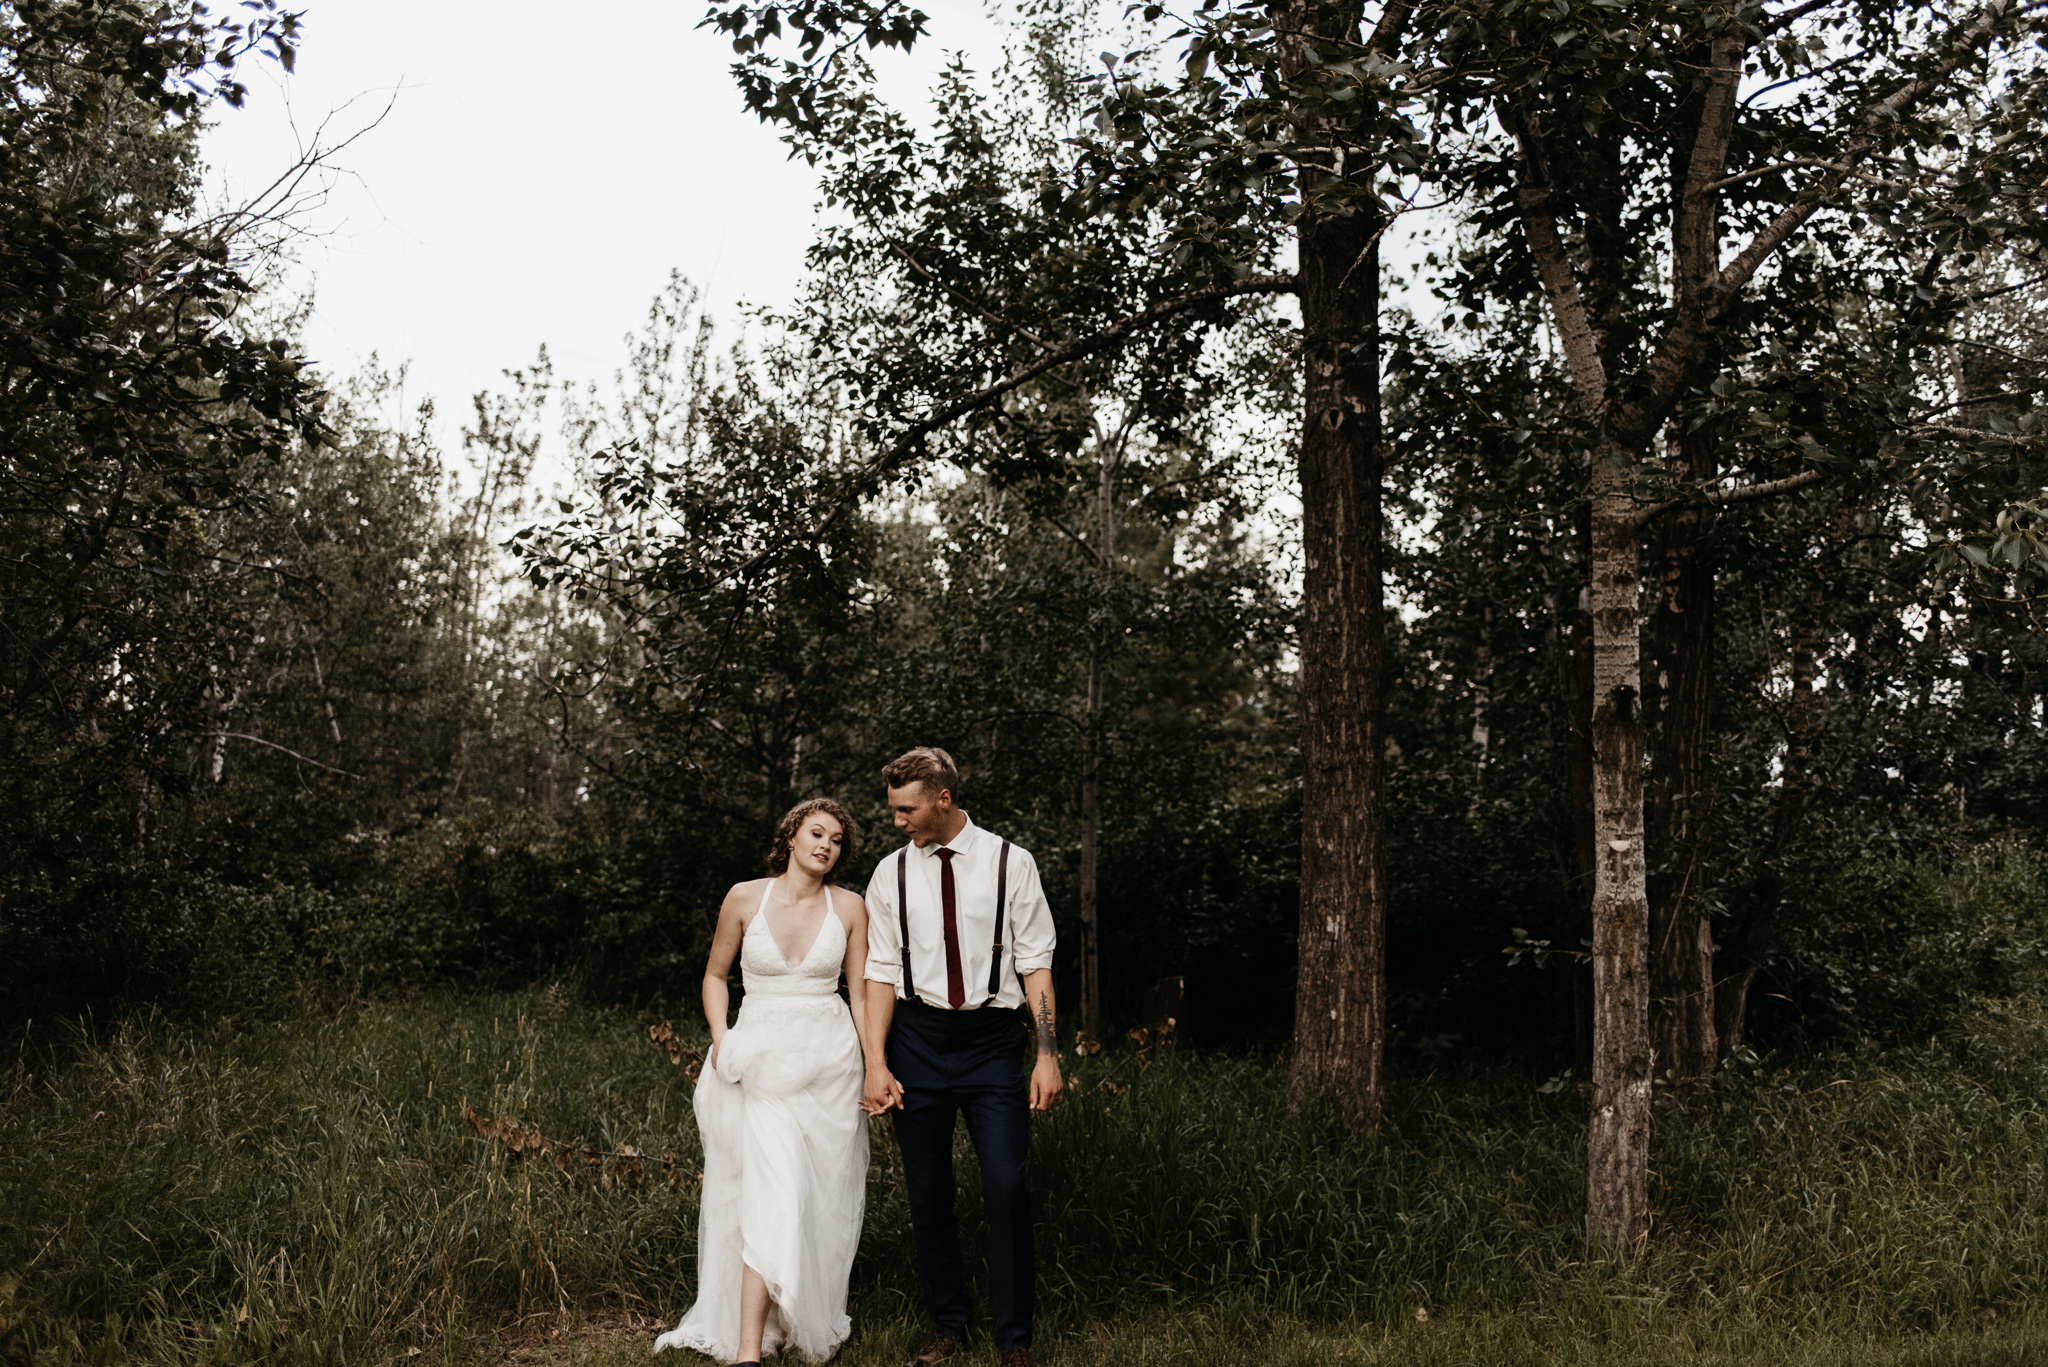 J&C-Weddingblog-116.jpg